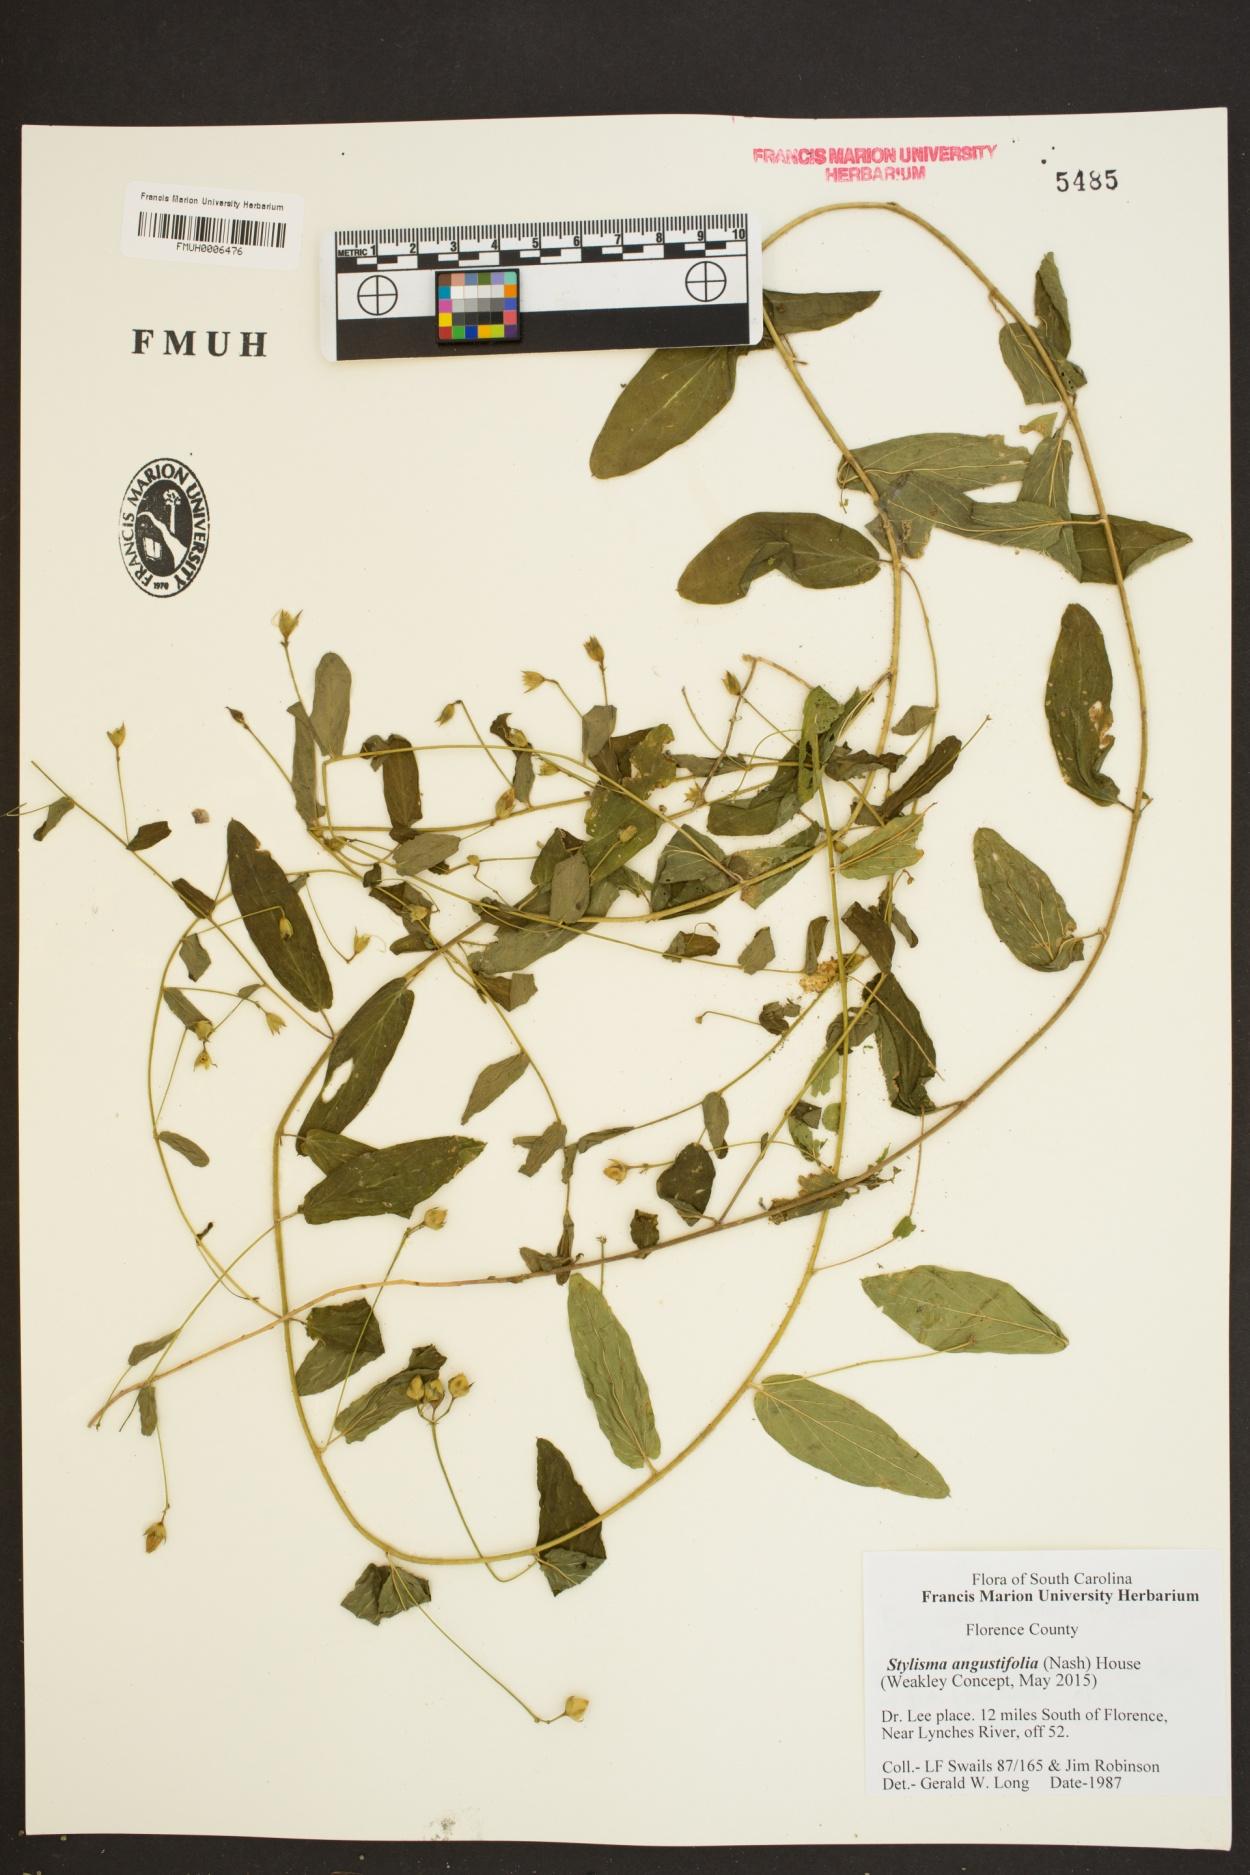 Stylisma patens ssp. angustifolia image